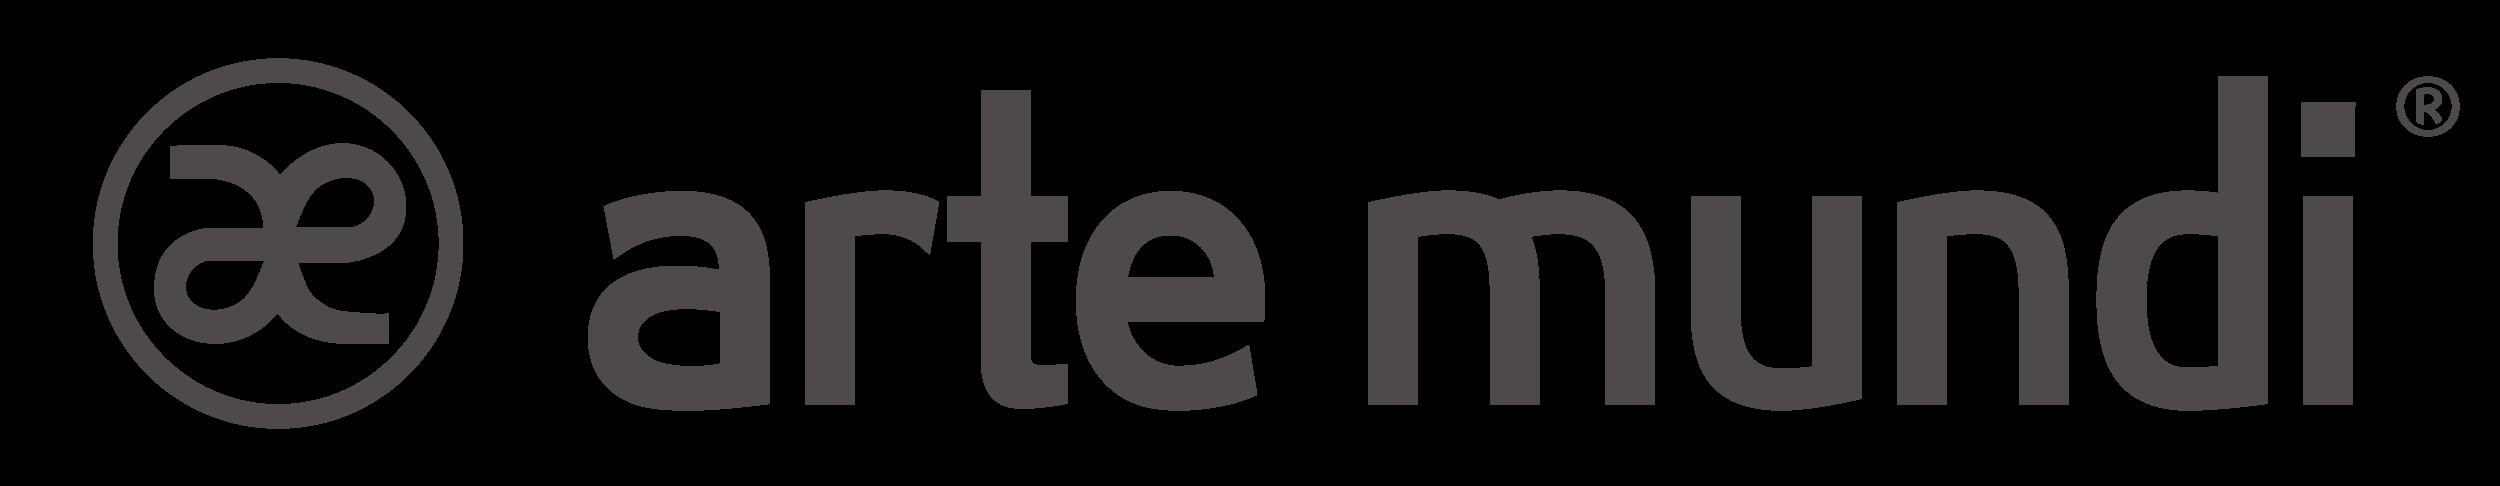 ArteMundi_Creatives_Logo-No_Line.png